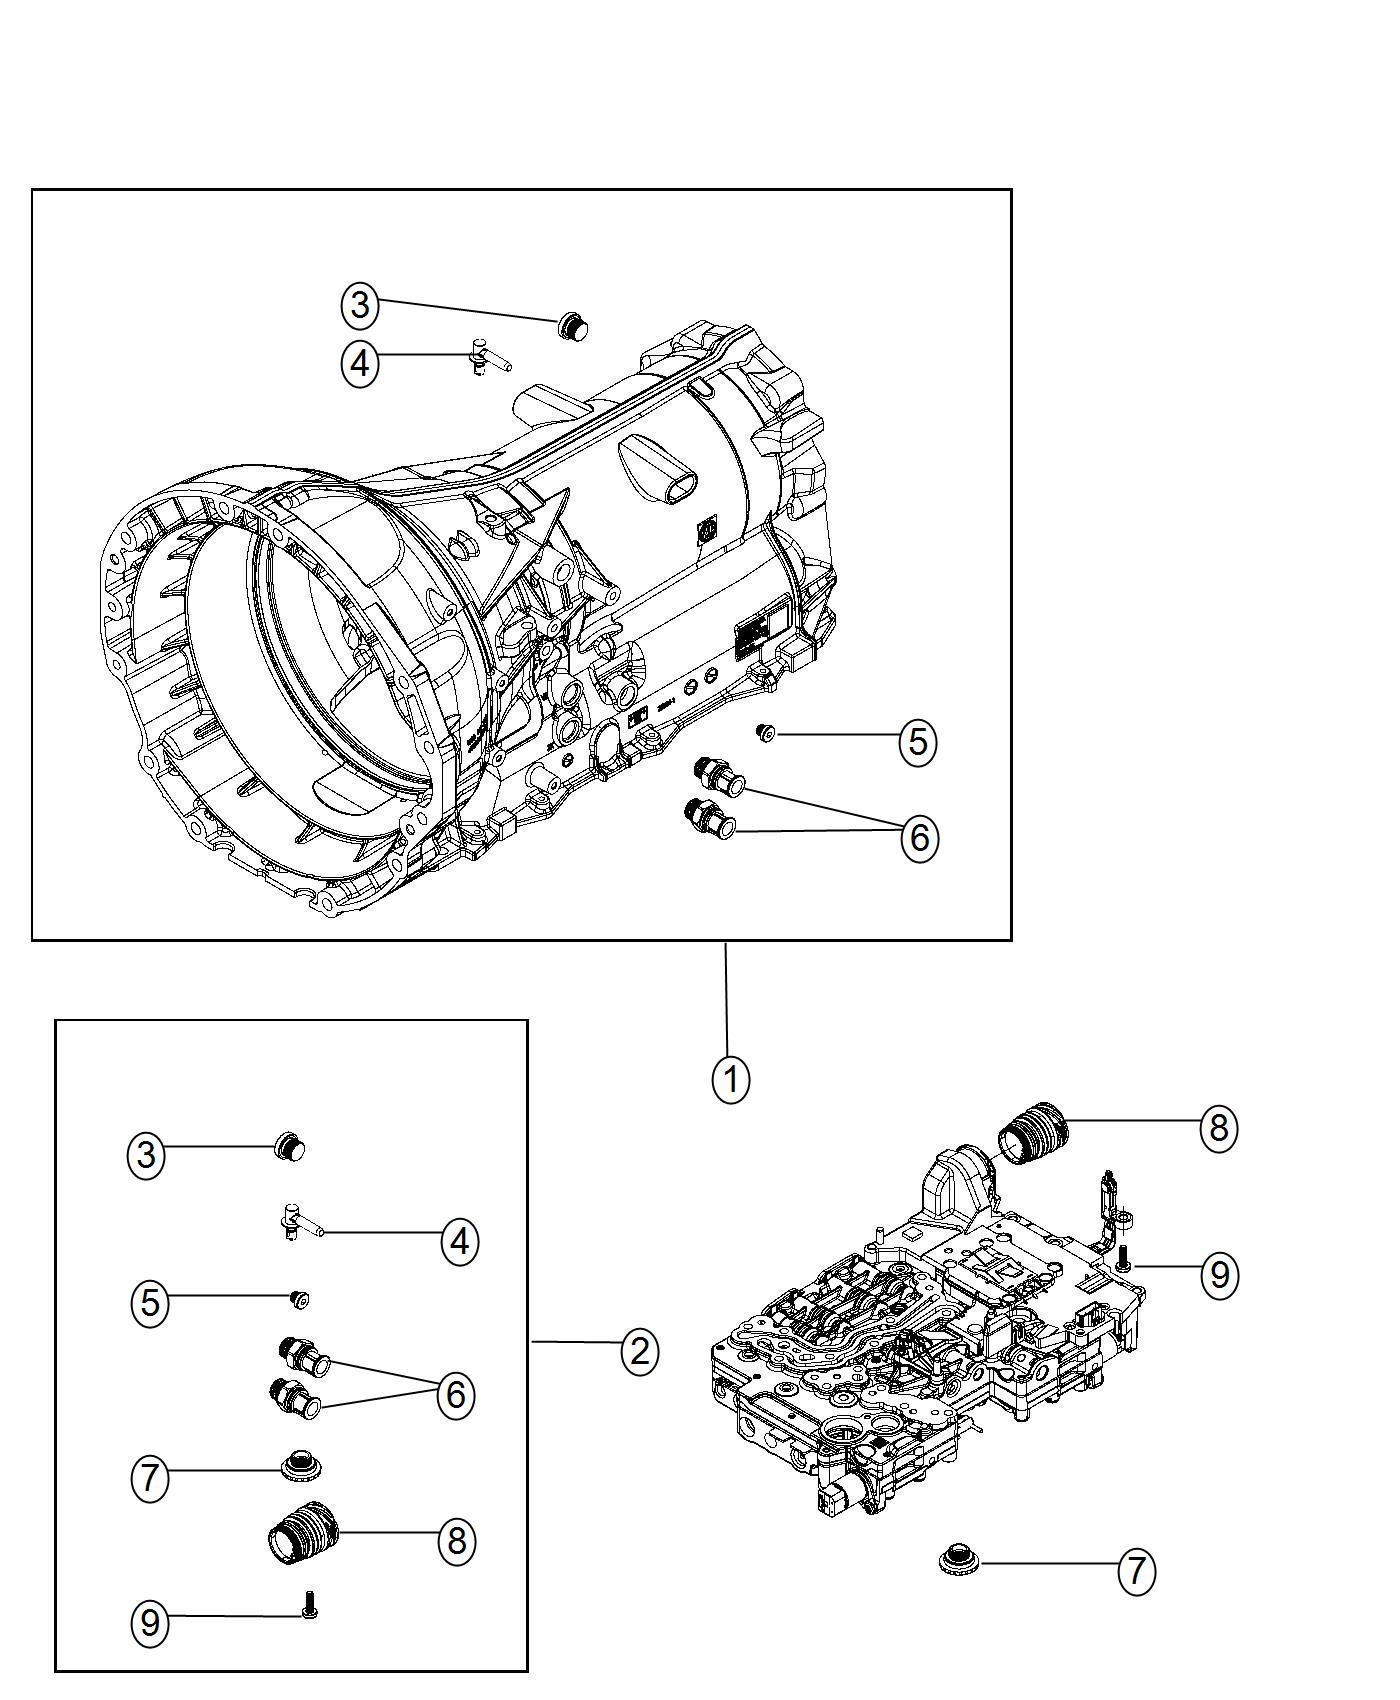 Dodge Durango Screw Torx Head M6x1 00x20 00